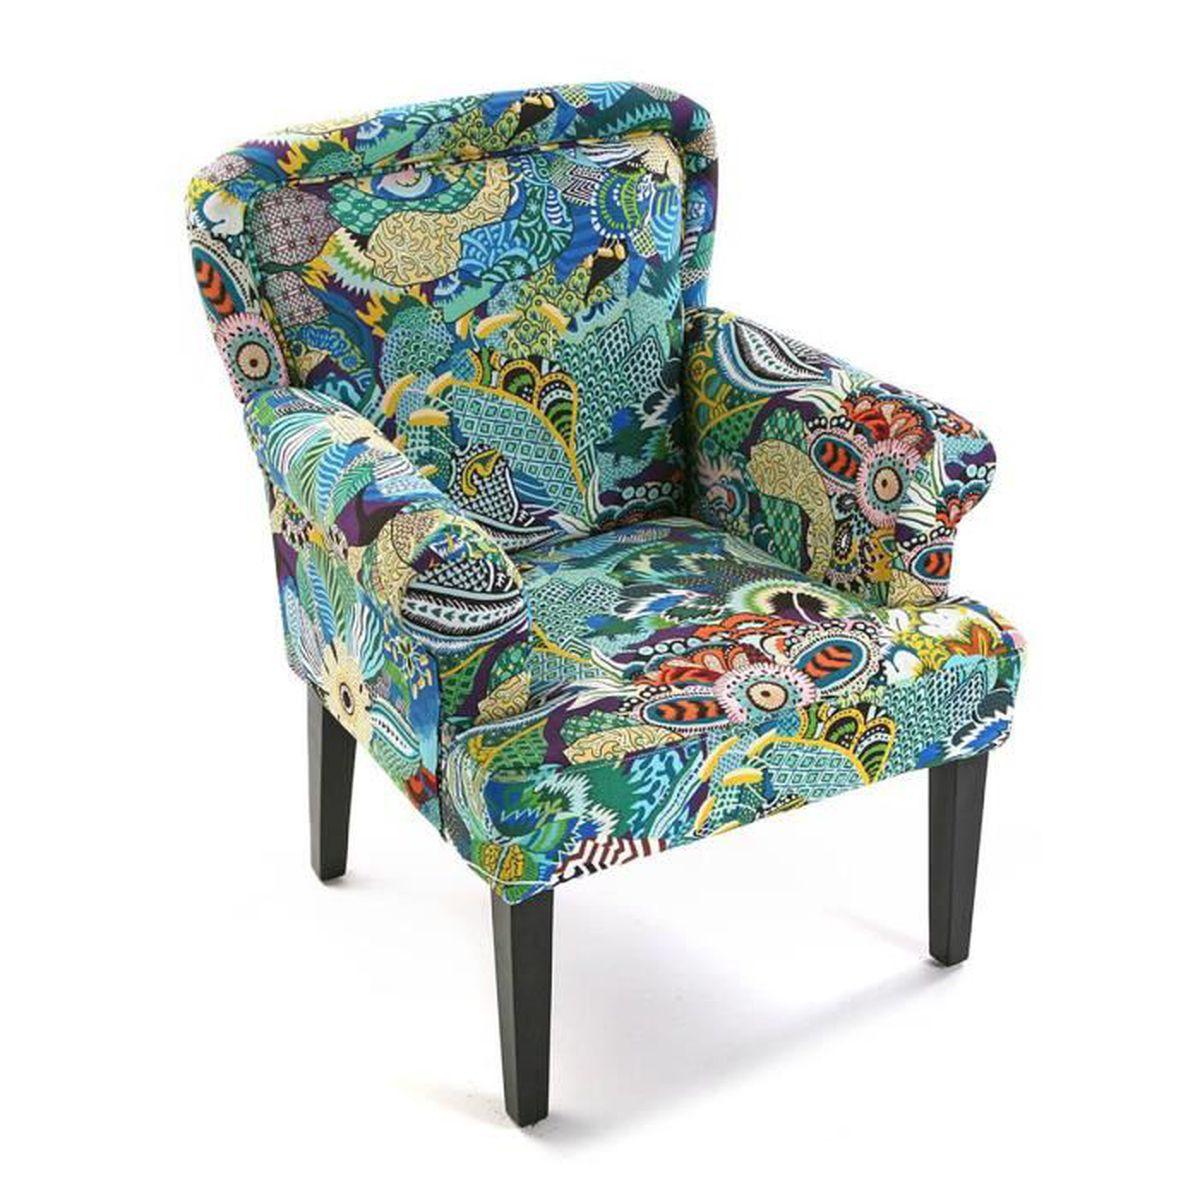 fauteuil tropical multicolore achat vente fauteuil cdiscount. Black Bedroom Furniture Sets. Home Design Ideas